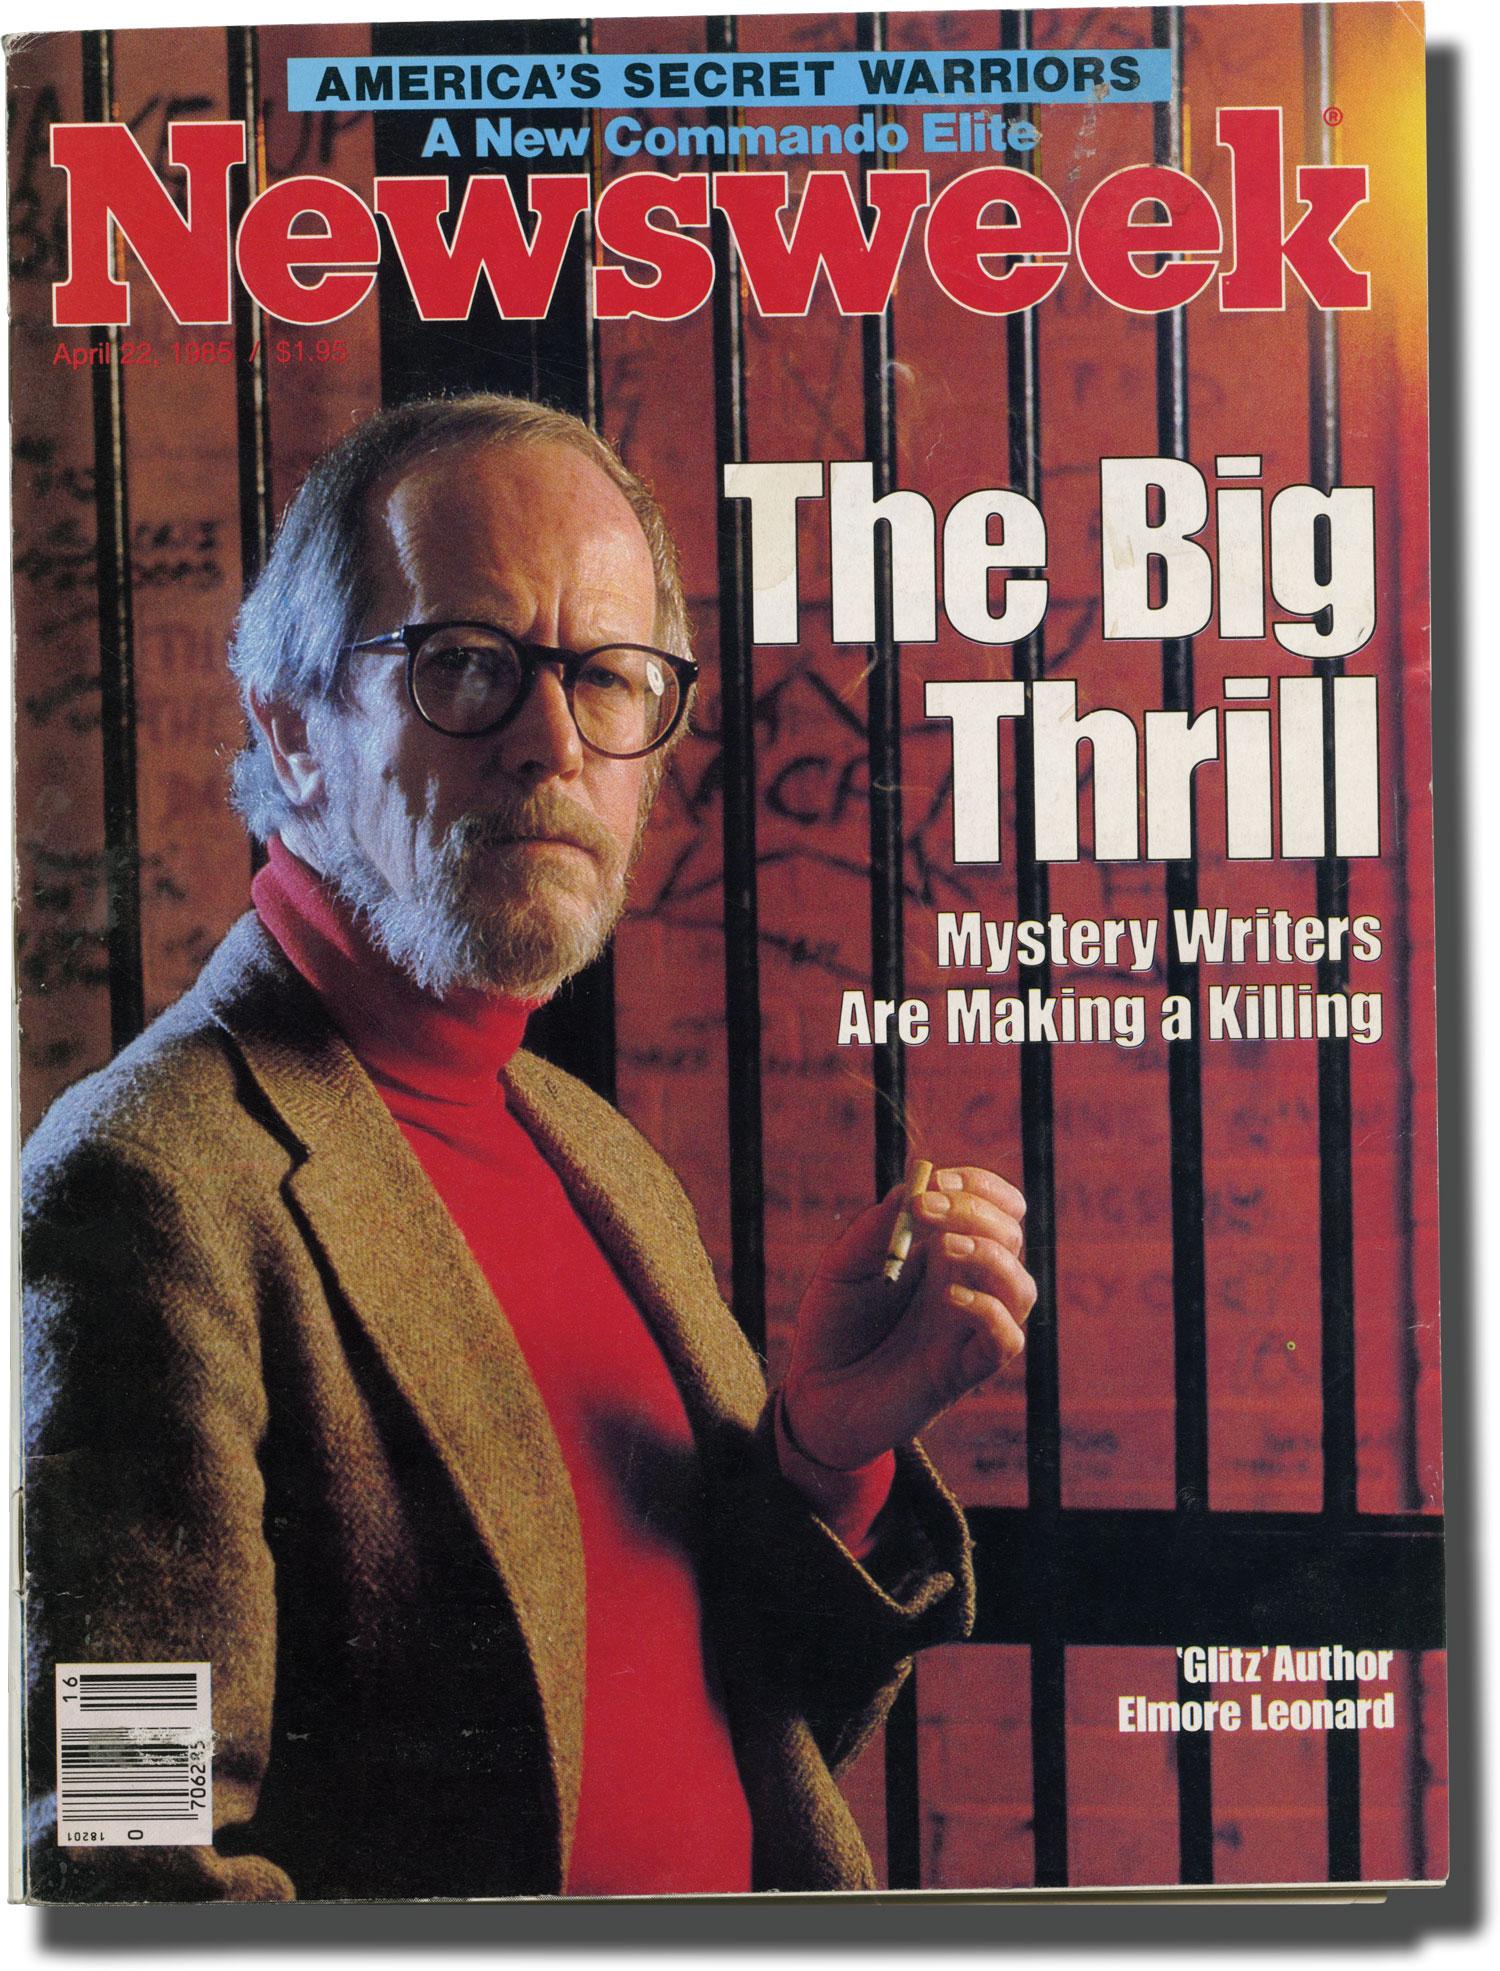 Newsweek Volume CV Number 16 April 22 1985 by Leonard Elmore